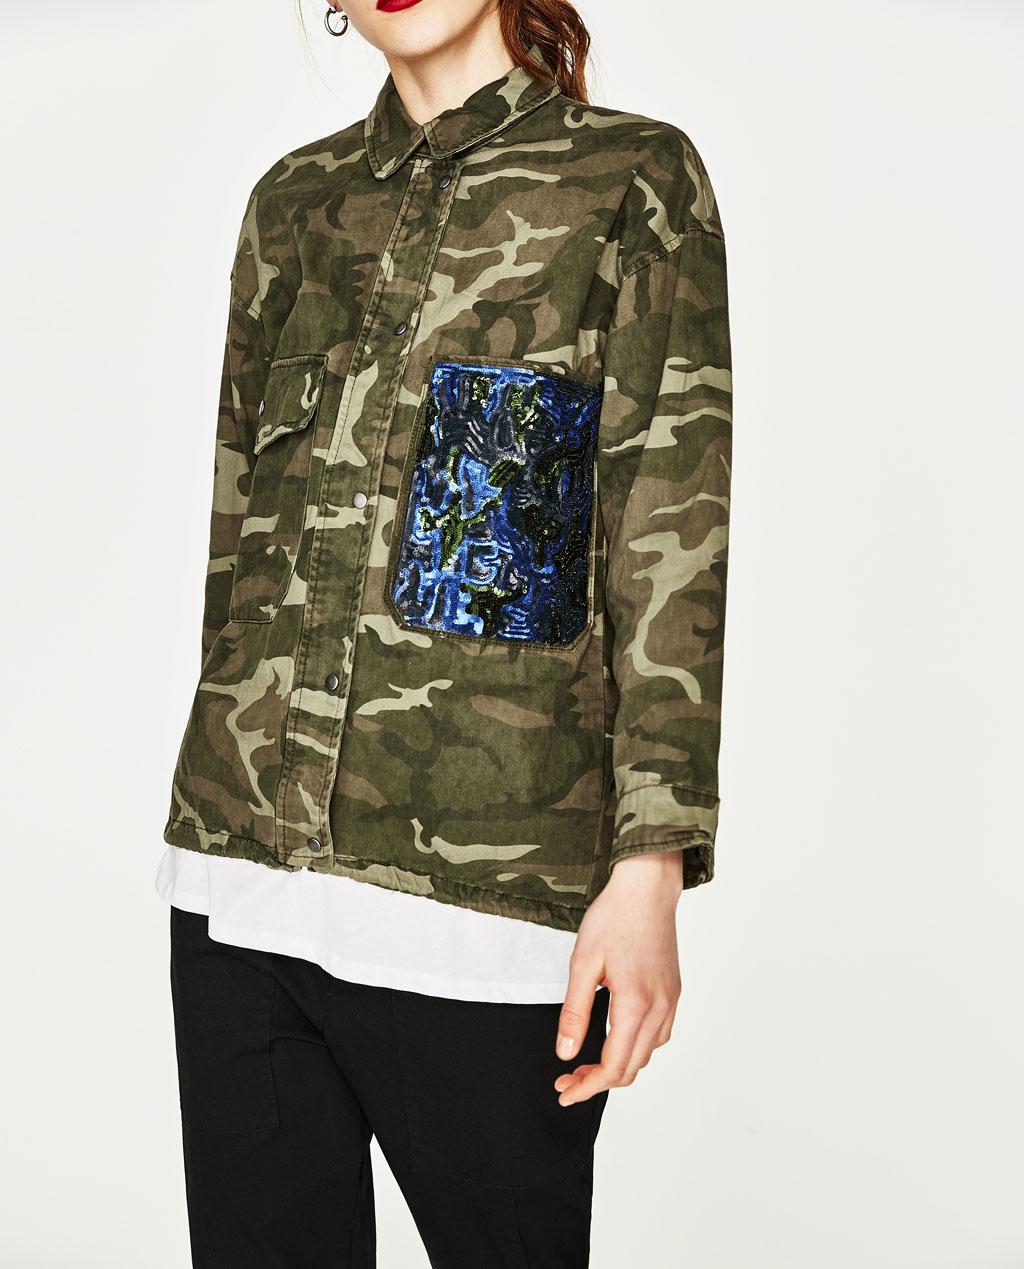 Military Precision Gutless Fashion Diaries